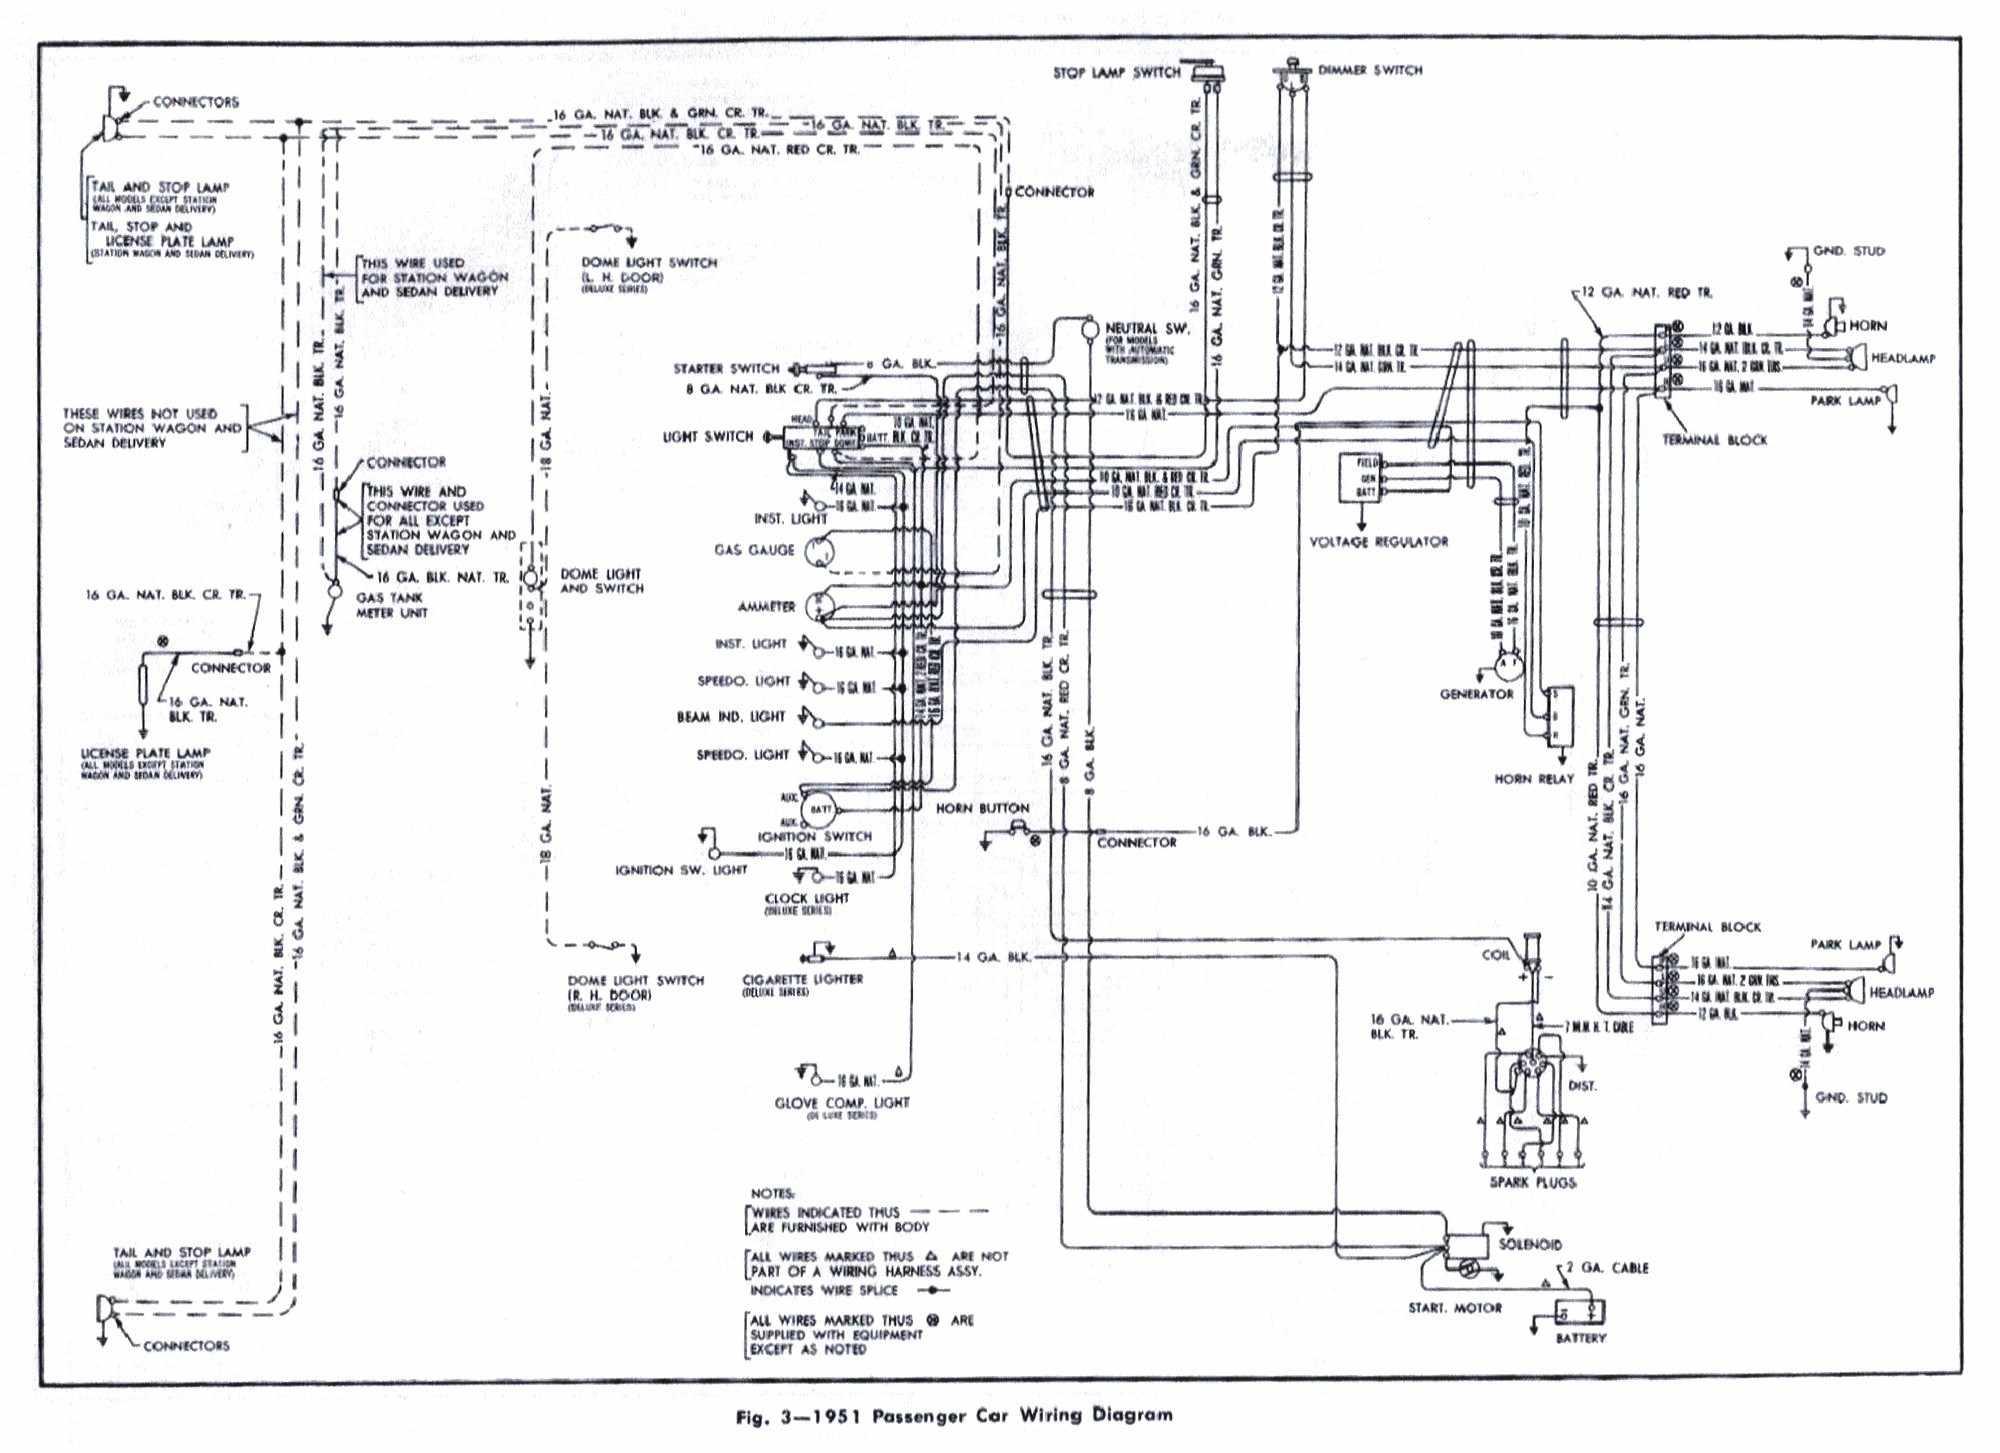 Car Wiring Diagrams App Auto Electrical Diagram 280zx